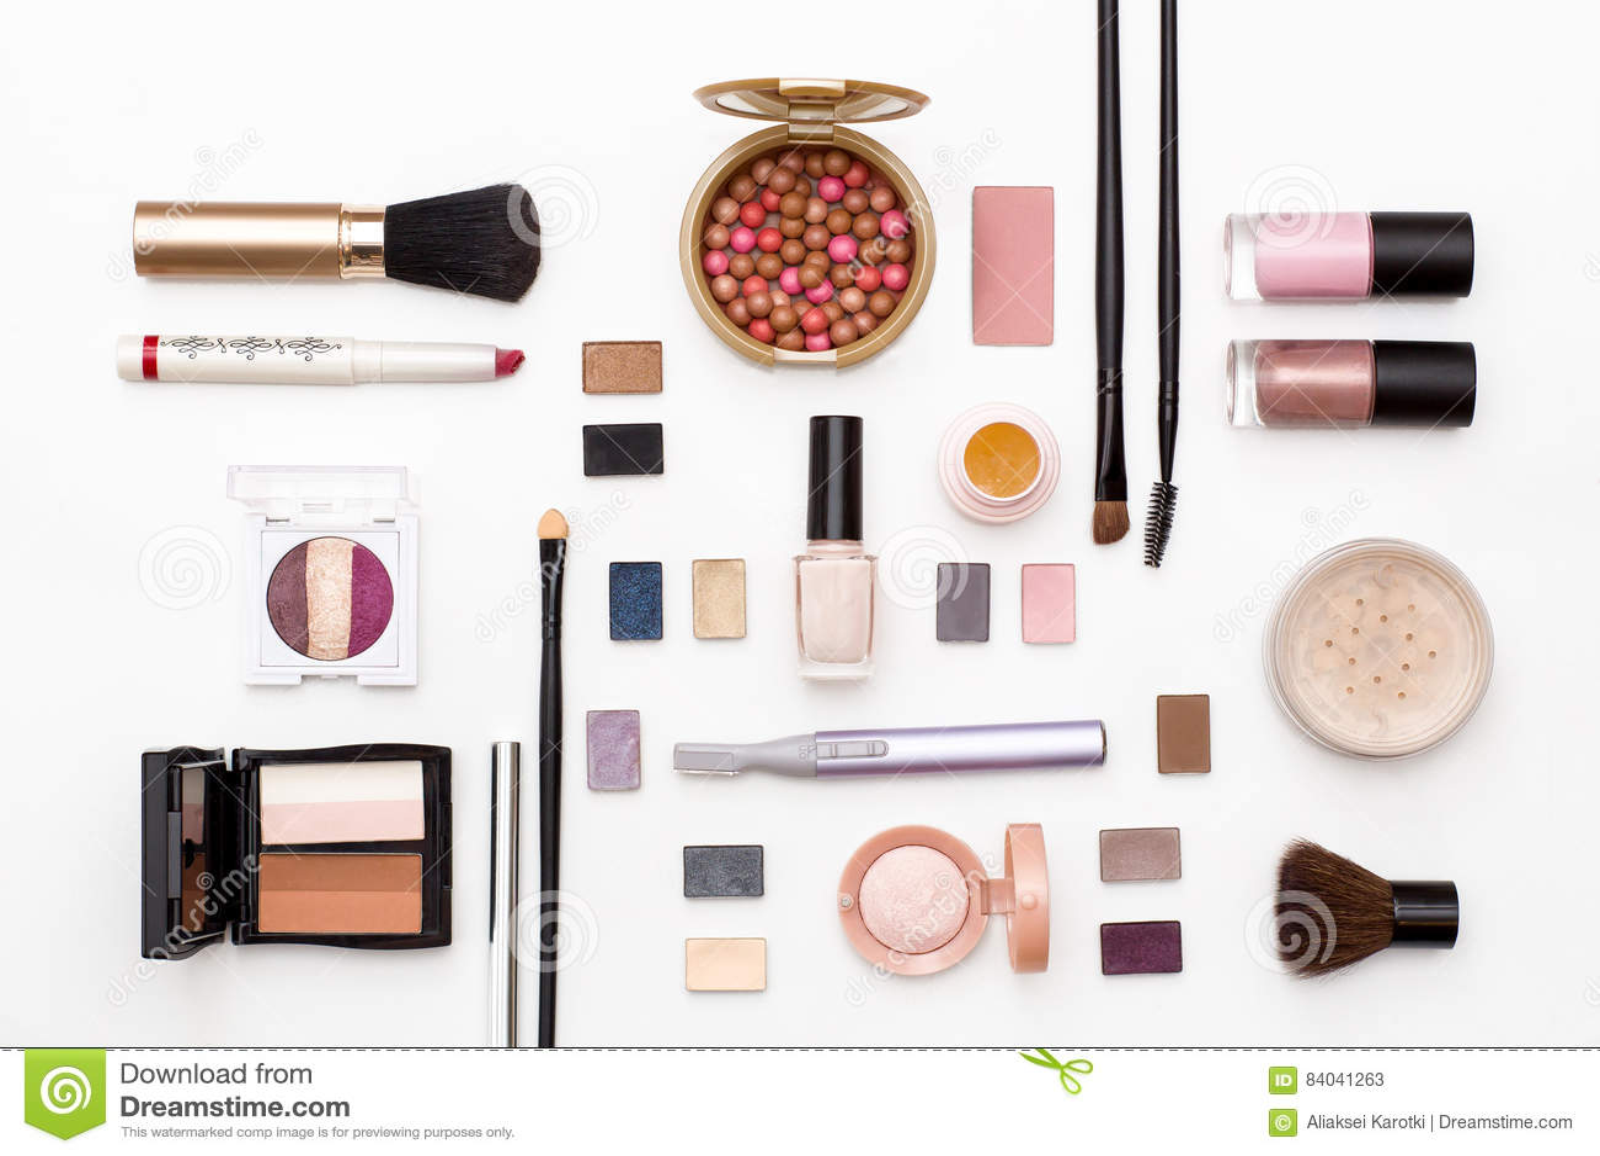 Cosmetics For Facial Makeup Brushes Powder Lipstick Eye Shadow Nail Polish Trimmer And ...